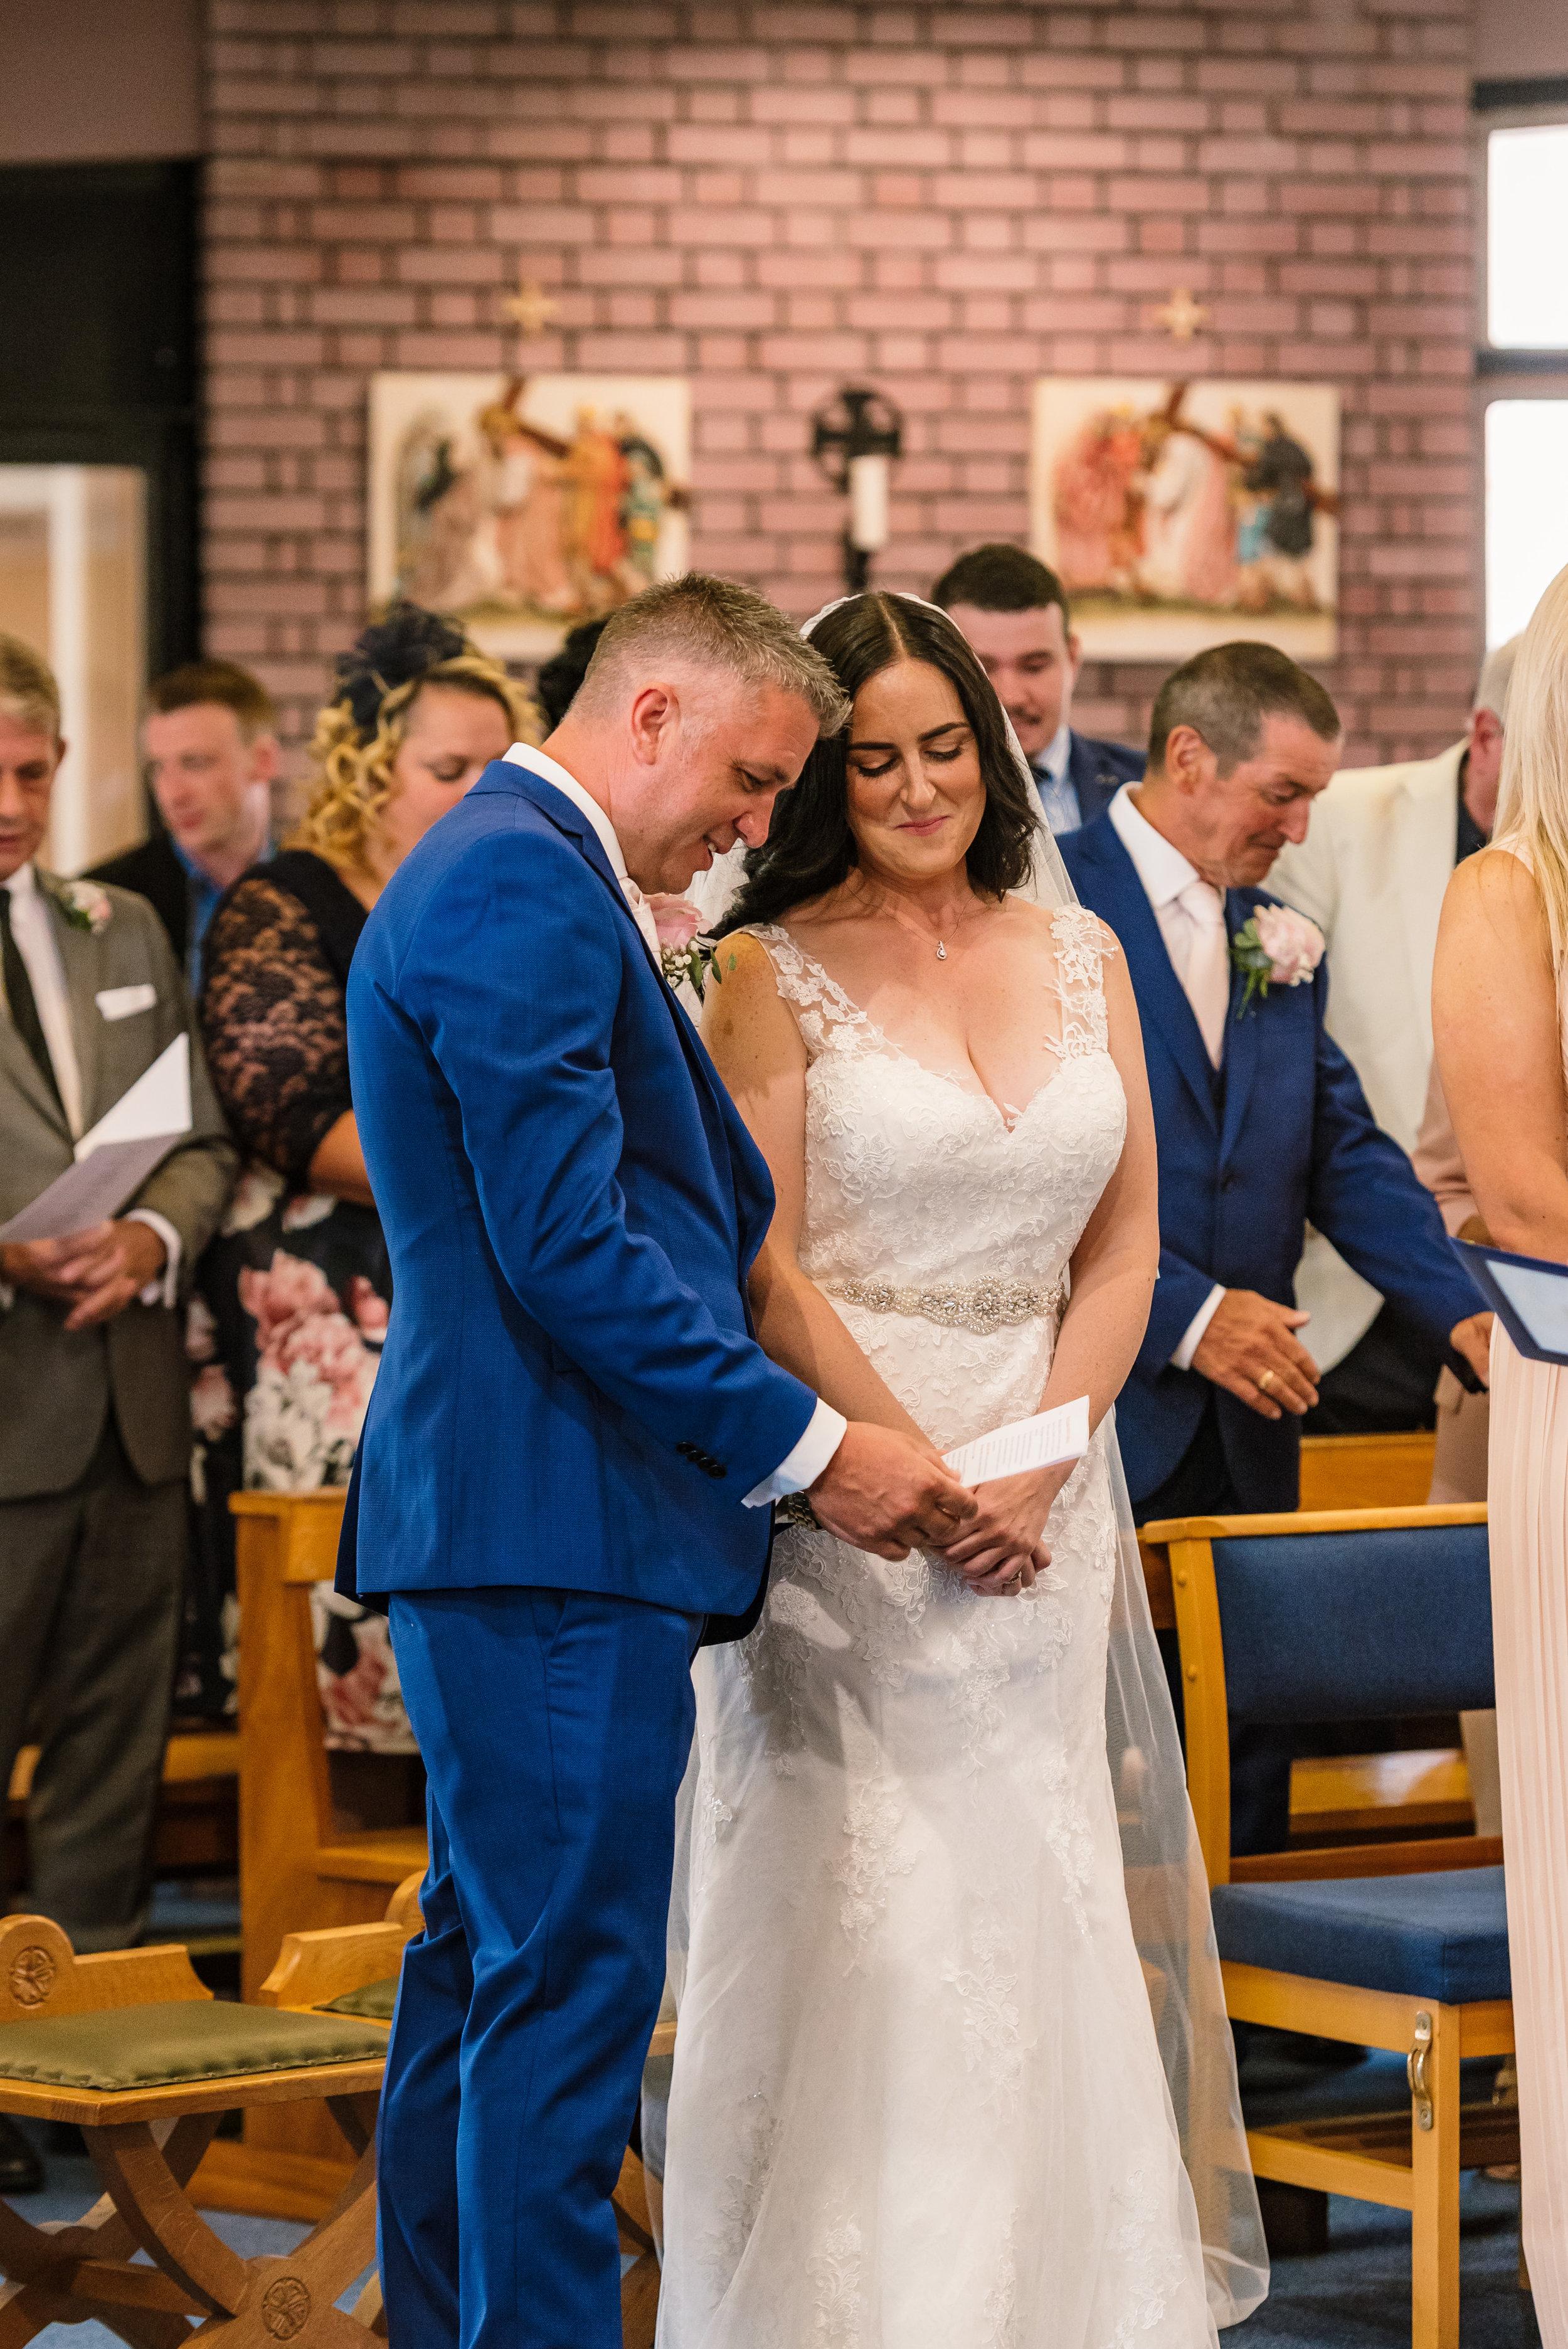 Sarah-Fishlock-Photography : Hampshire-wedding-photographer-hampshire : fleet-wedding-photographer-fleet : Meade-Hall-Wedding-Photographer : Meade-Hall-Wedding-Photos-439.jpg